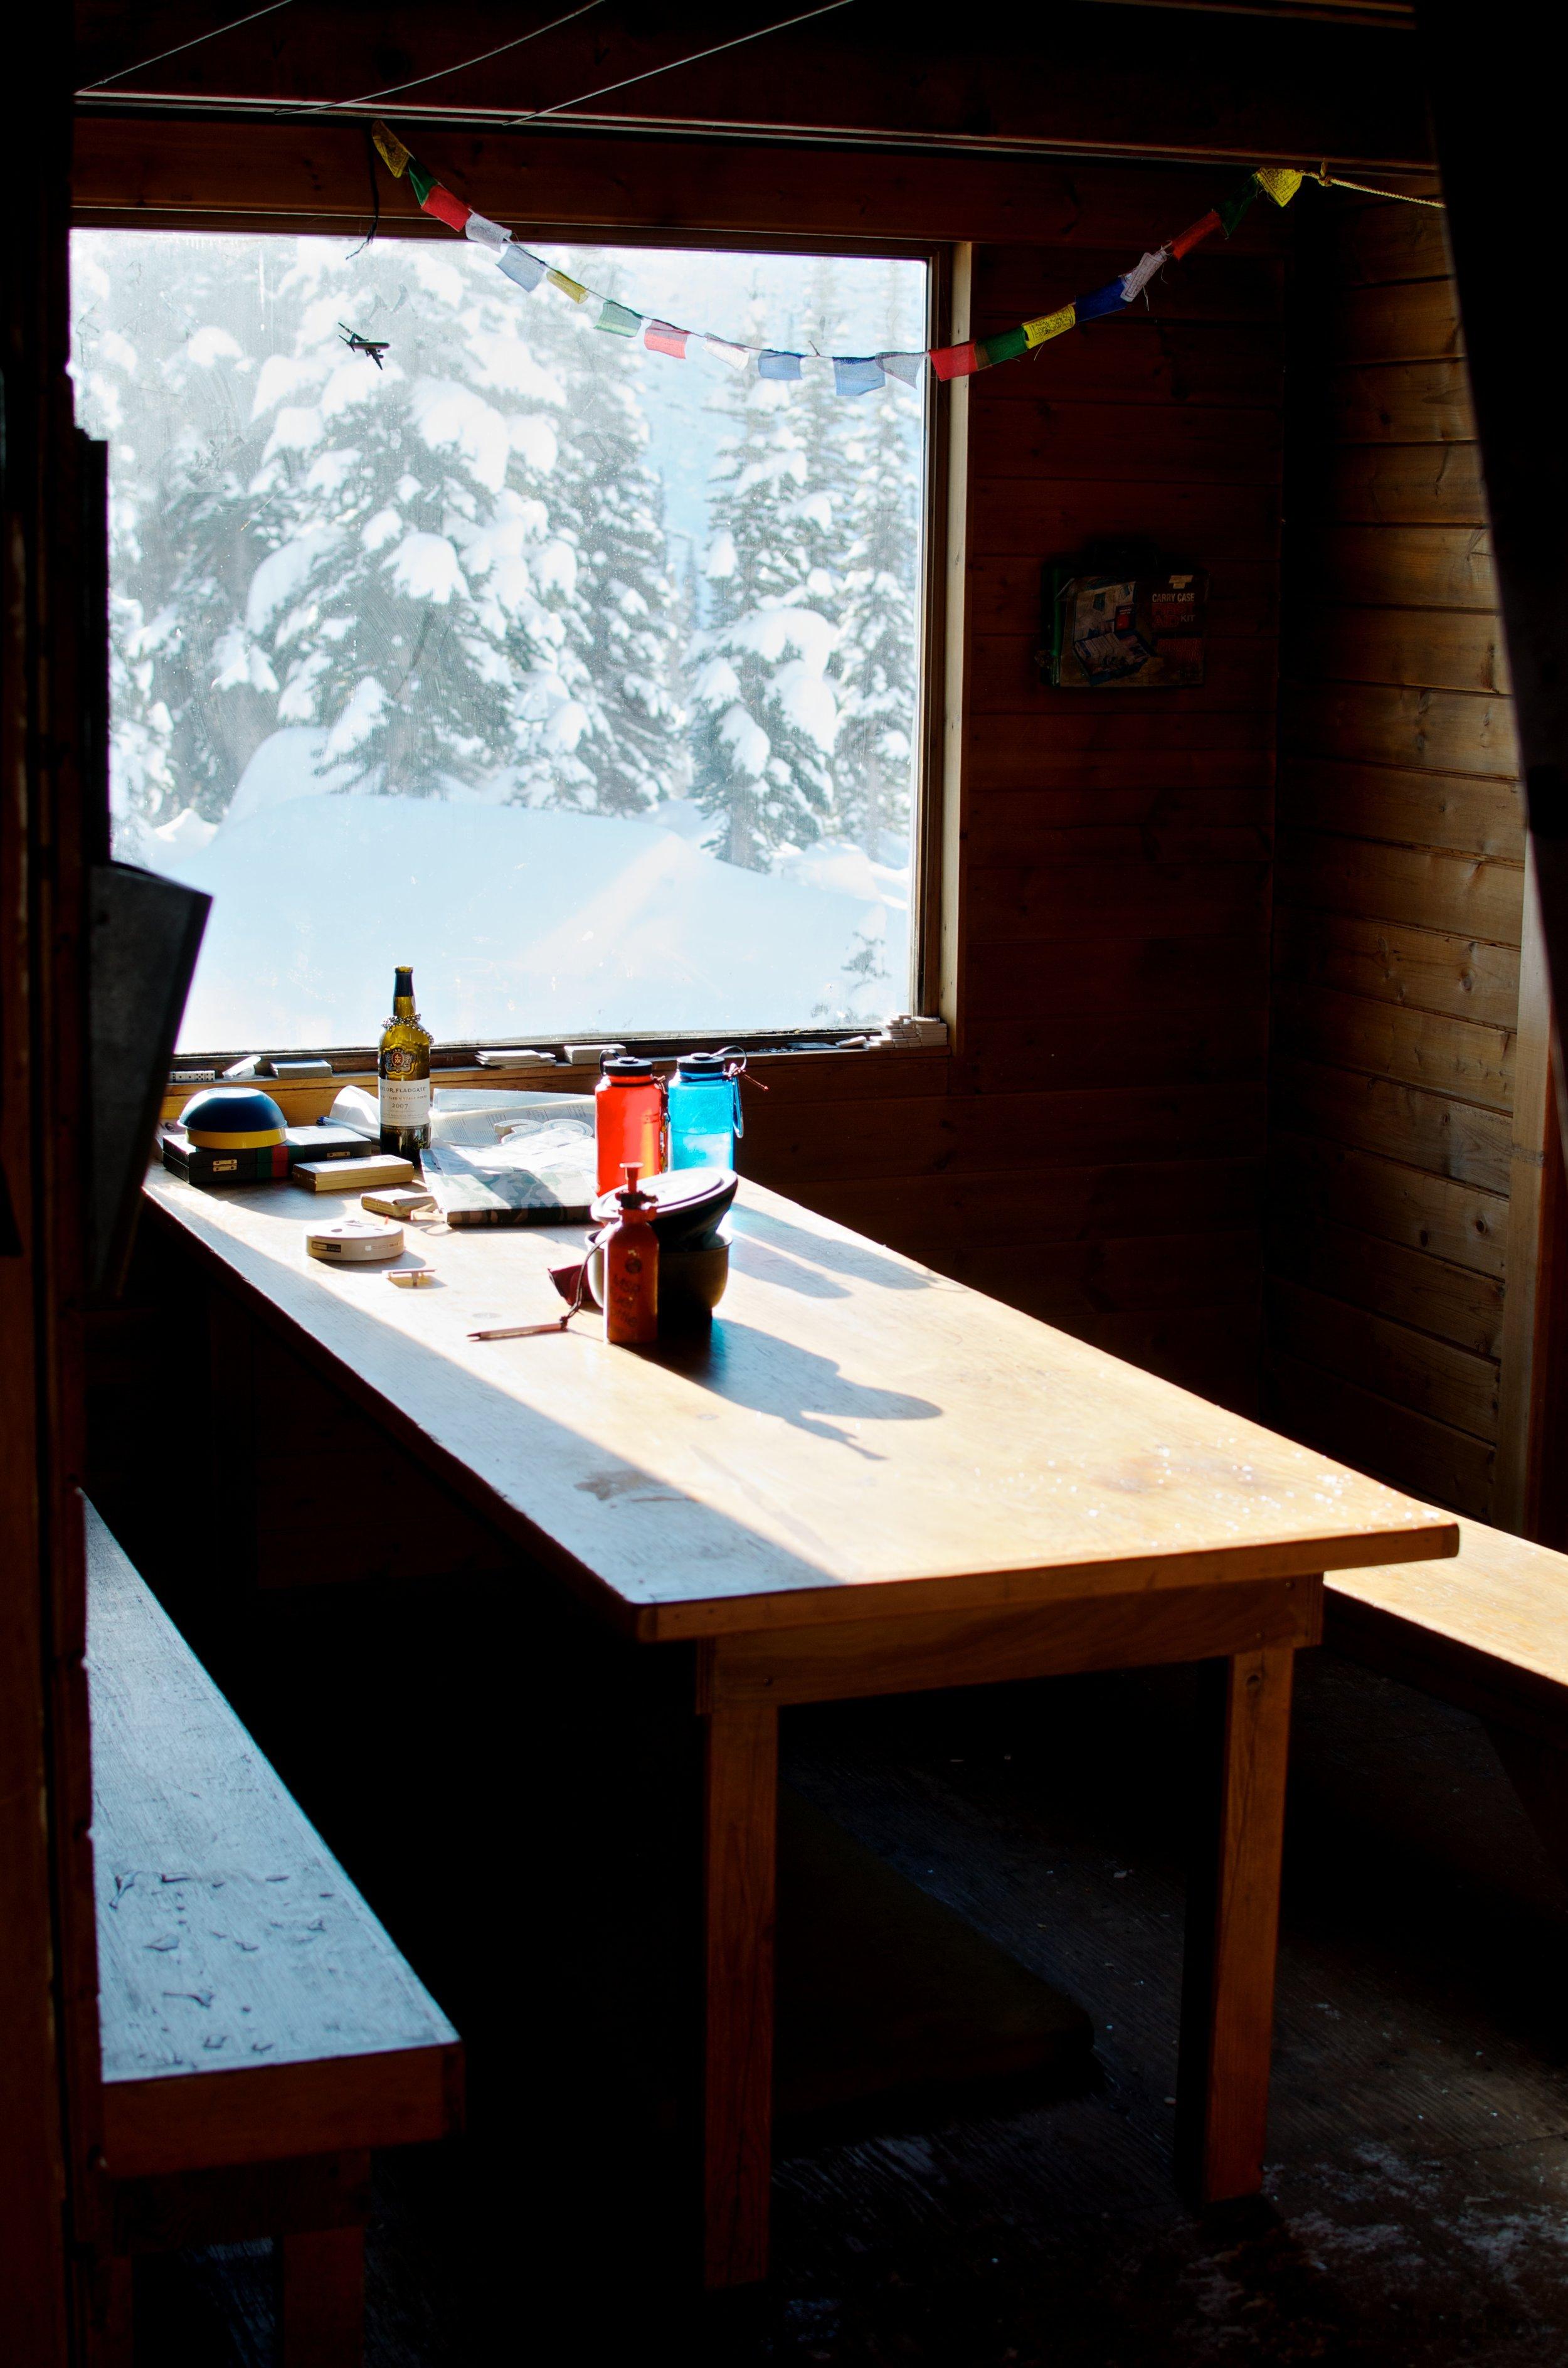 Interior of the Wendy Thompson Hut